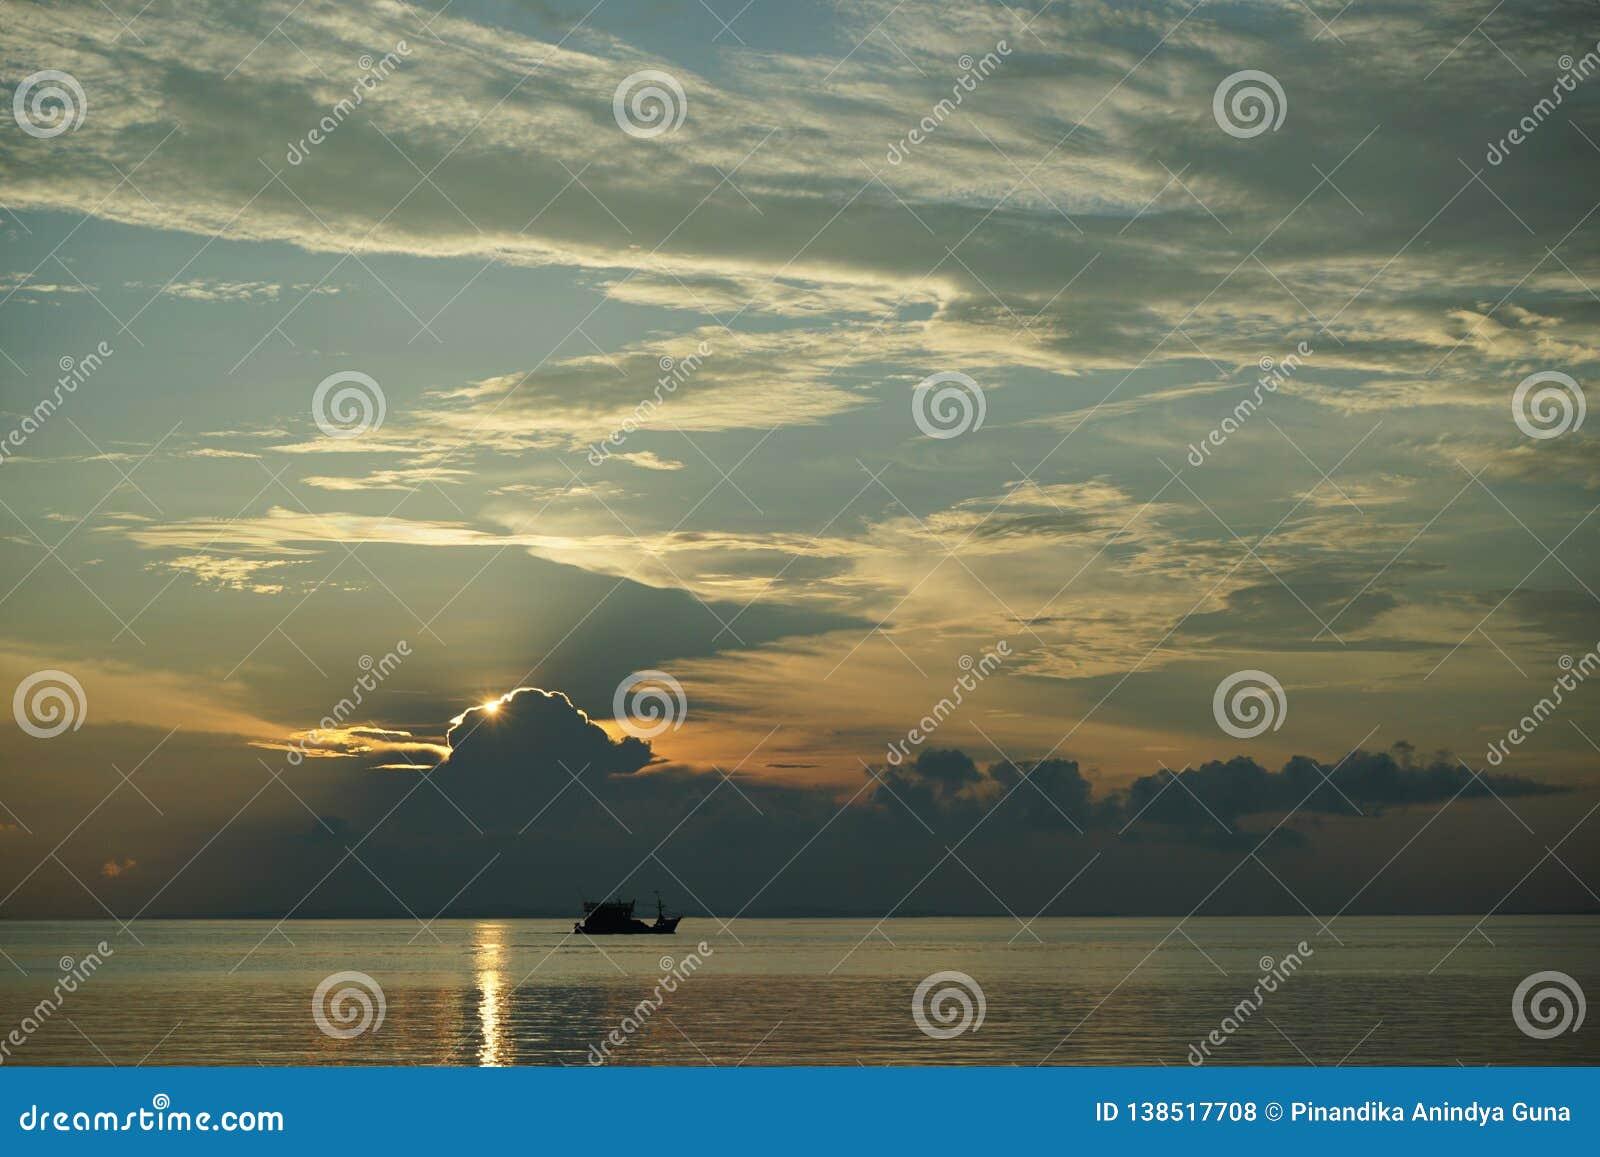 Шлюпка на заходе солнца и восходе солнца с драматическим небом над океаном